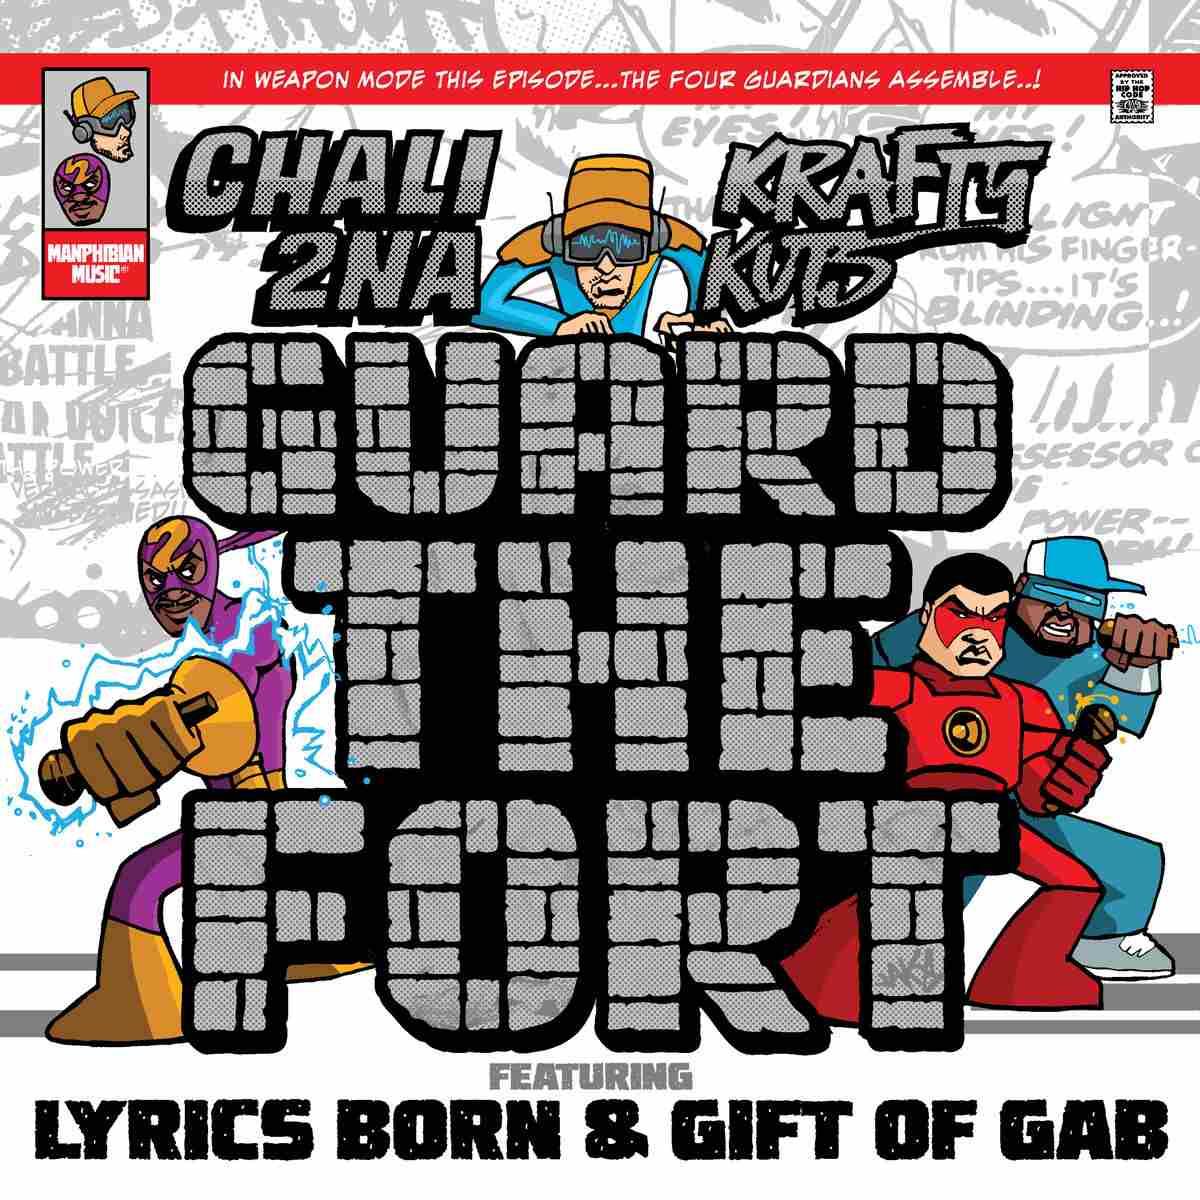 Rap, beats & breaks - shake a hoof to the latest rhymes, funky breaks and boom bap beats